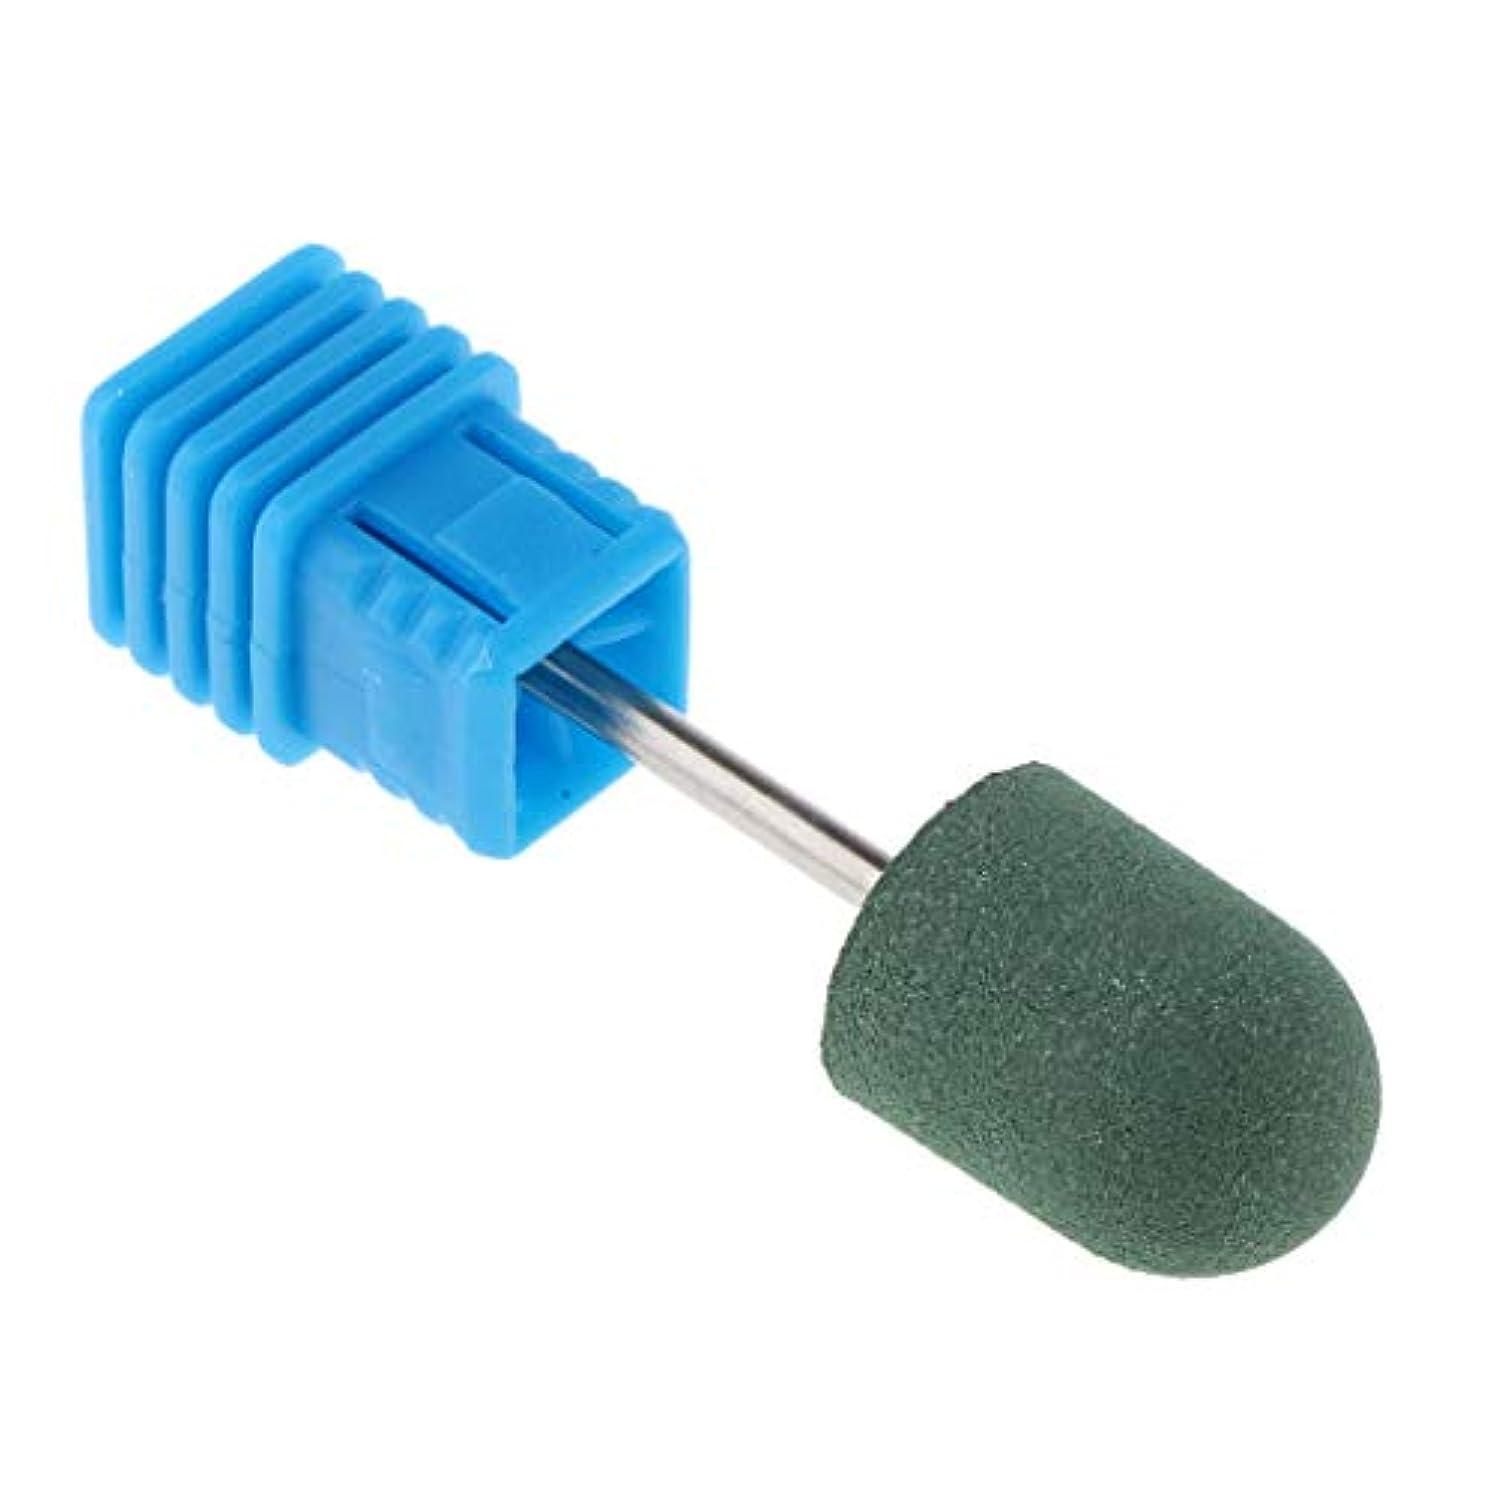 gazechimp 3サイズ選択 電動ネイルアートビット ドリルビット 研磨研削バフ ヘッド - 04